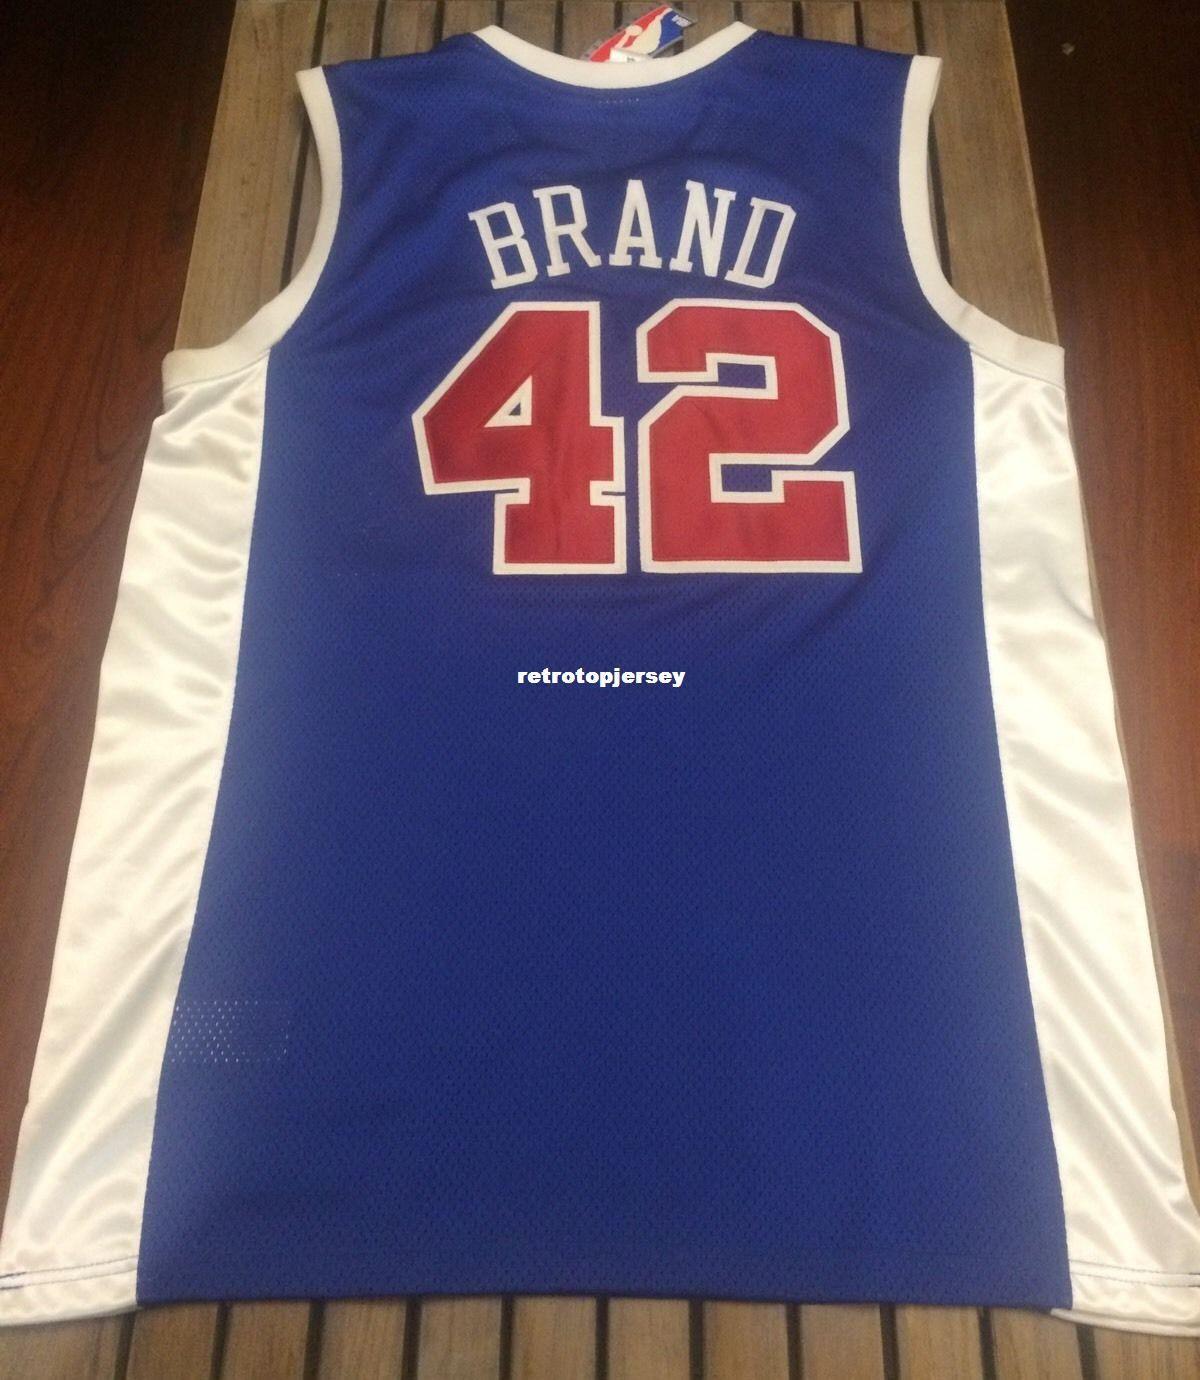 Günstige Großhandel Elton Brand Jersey Blau Nwt RB # 42 T-Shirt Weste genäht Basketball Trikots Ncaa